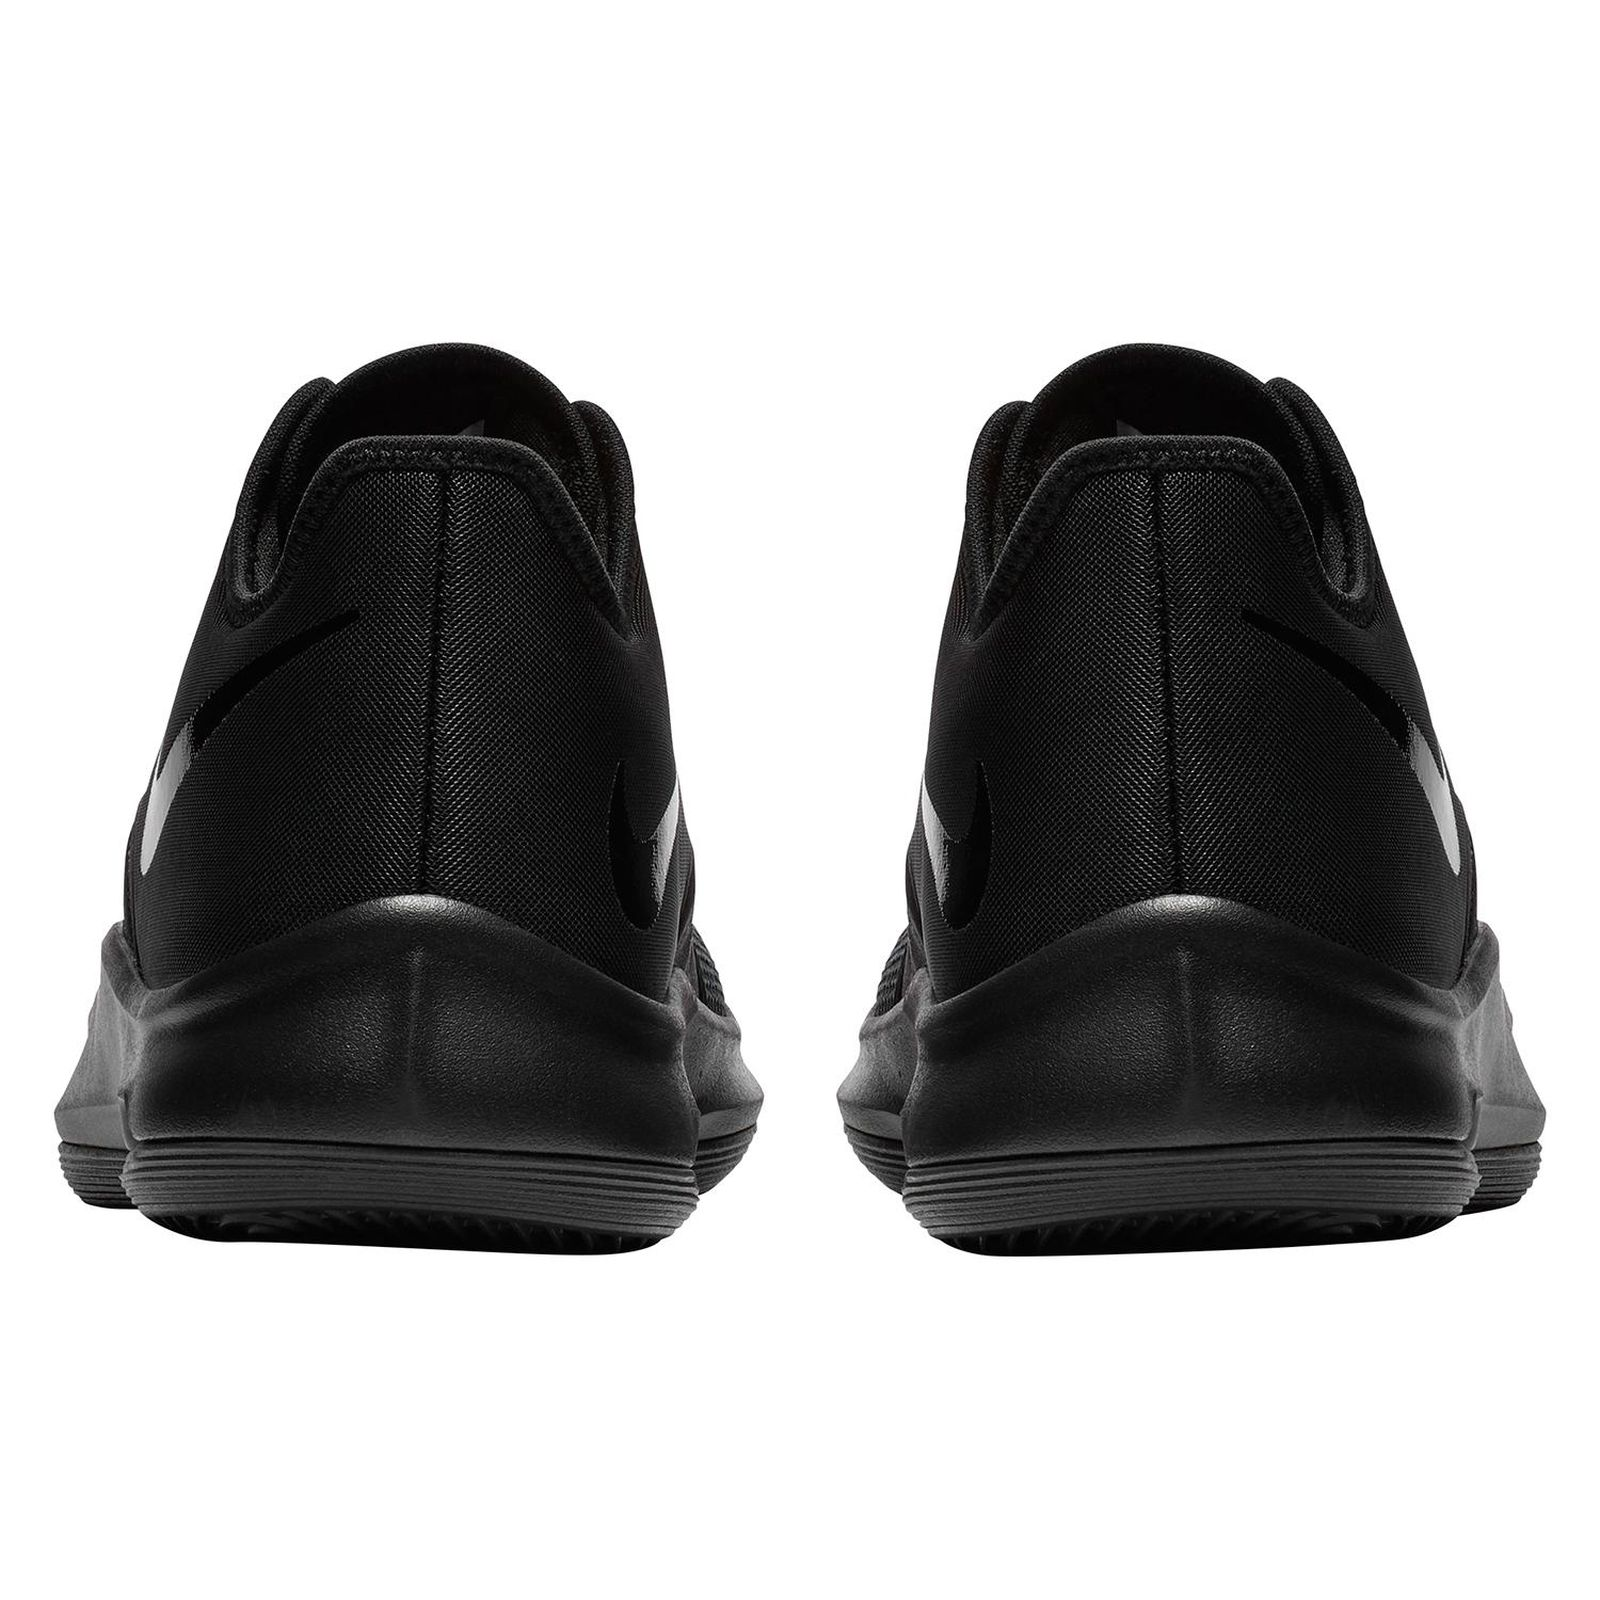 huge discount e5e5f adc79 Chaussures homme Nike basketball chaussures de sport chaussures NIKE AIR  VERSITILE III noir AO4430 002